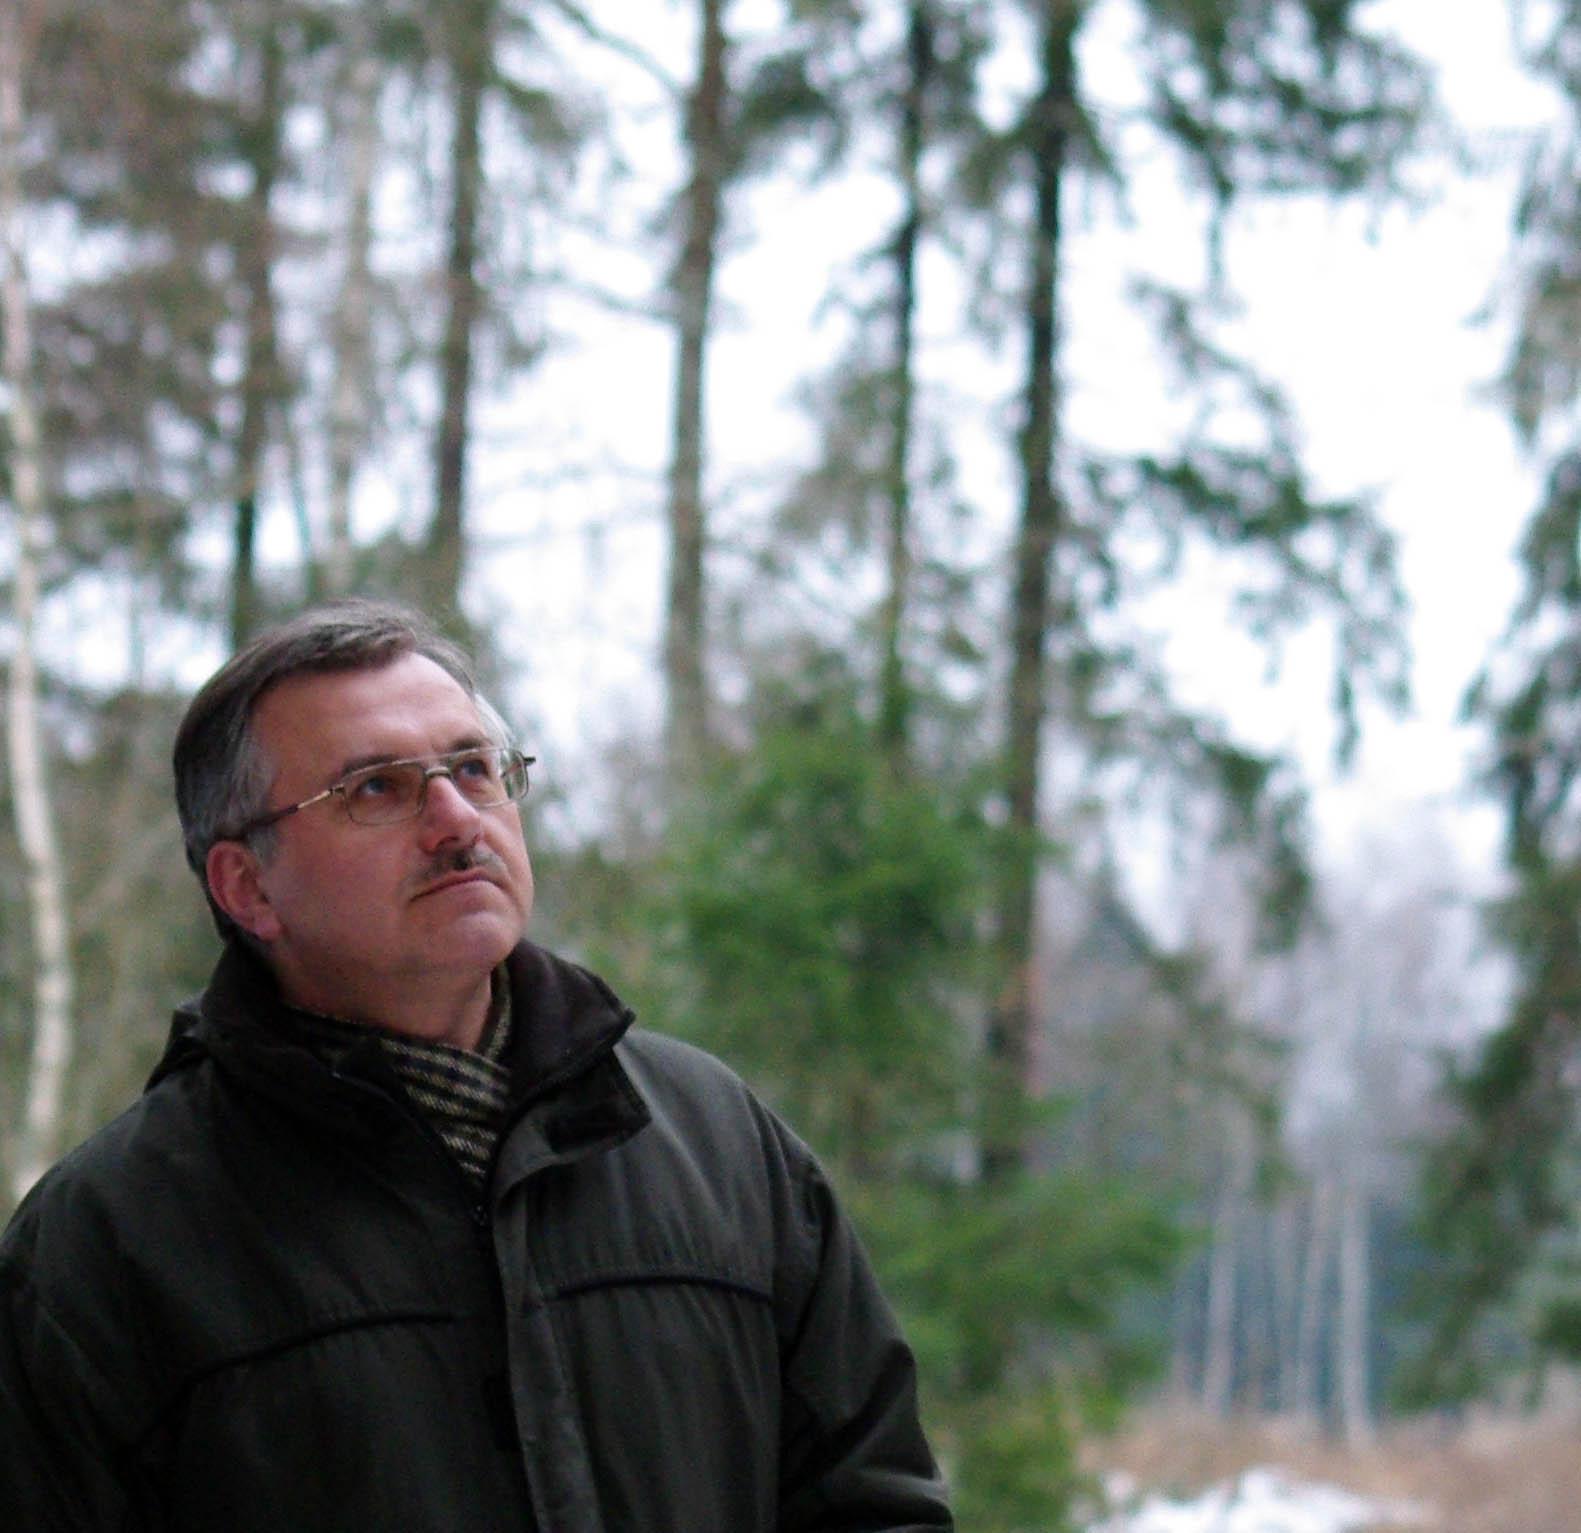 Etnokosmologas Jonas Vaiškūnas | Alkas.lt nuotr.